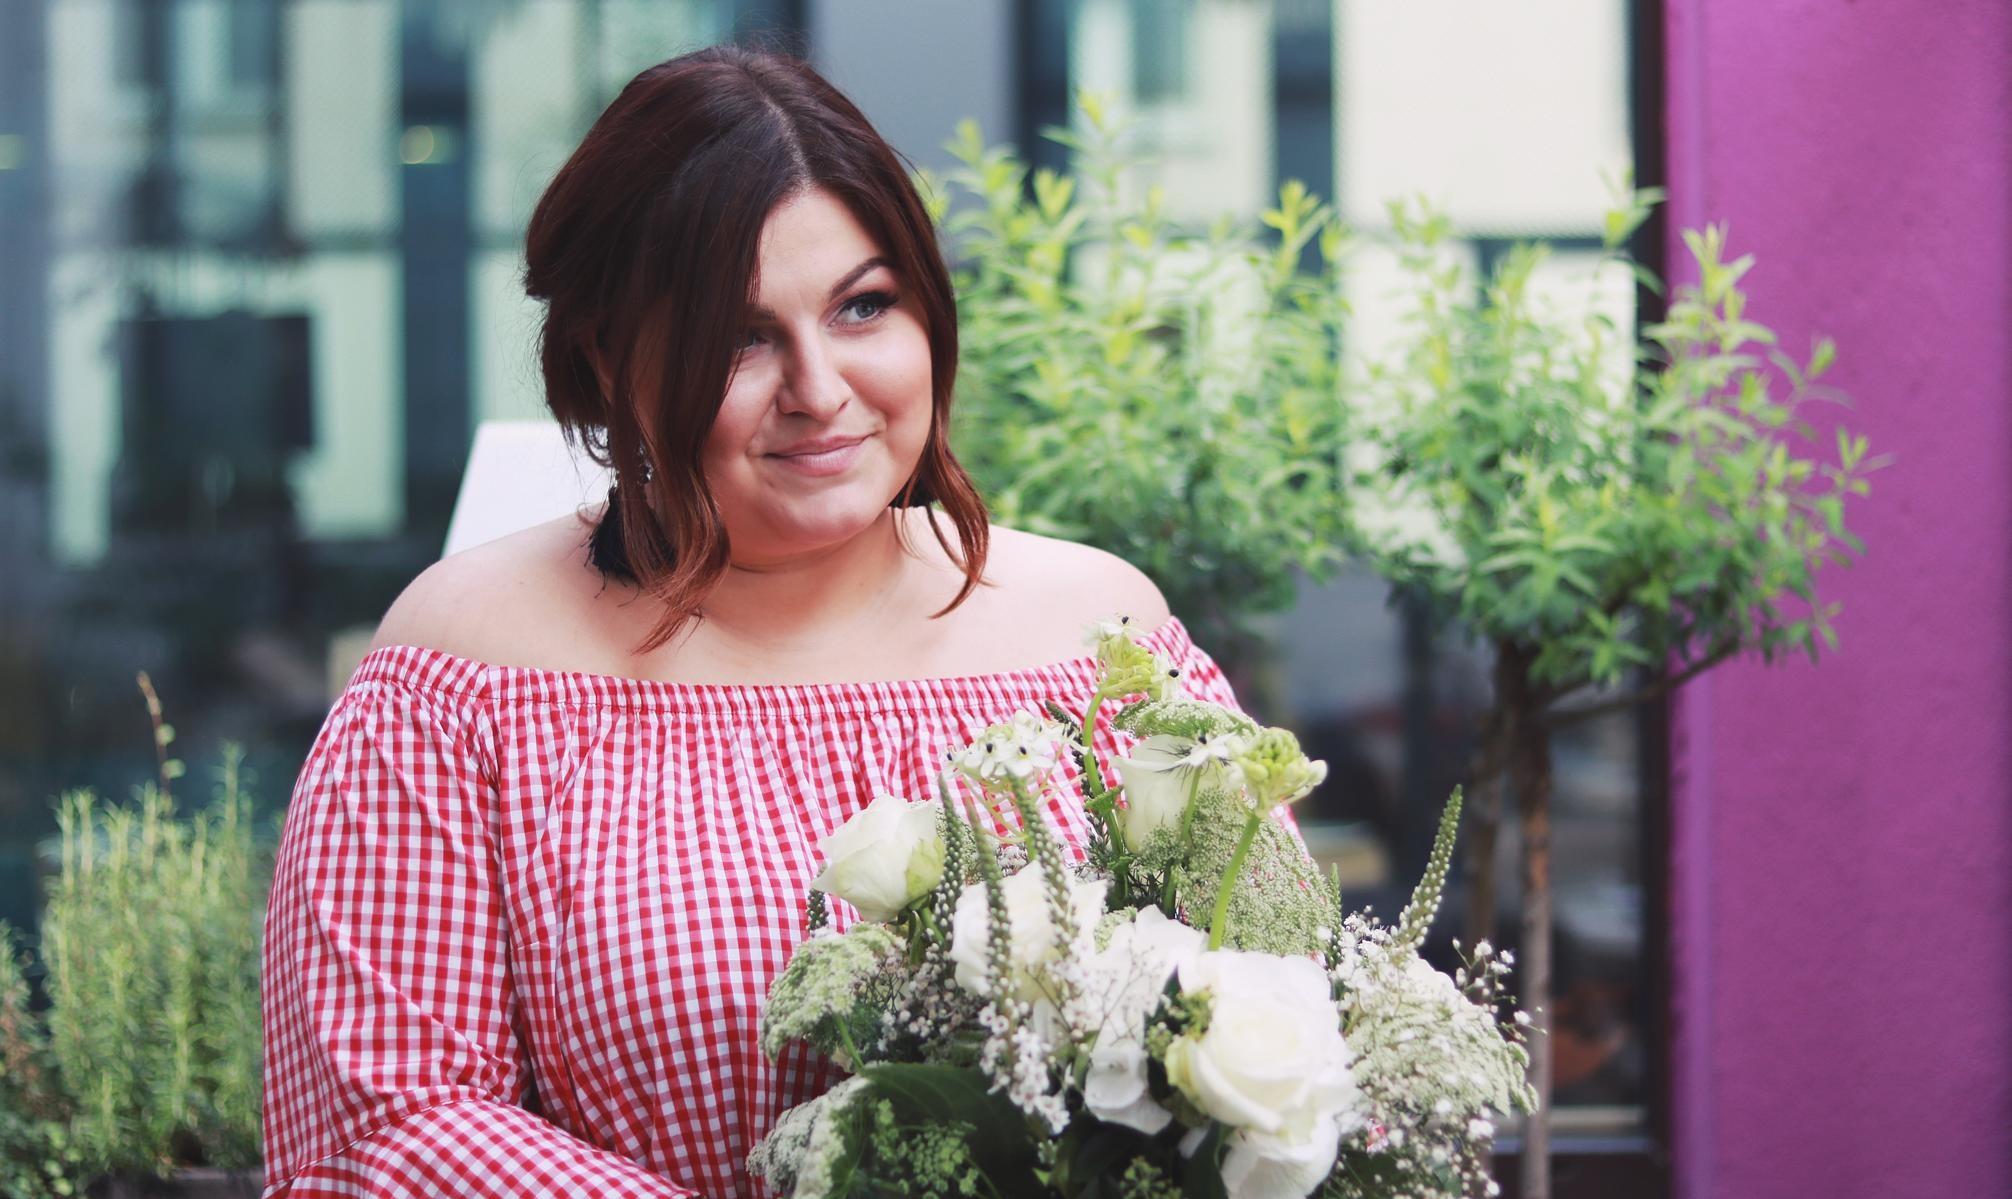 Bloggerin Ela